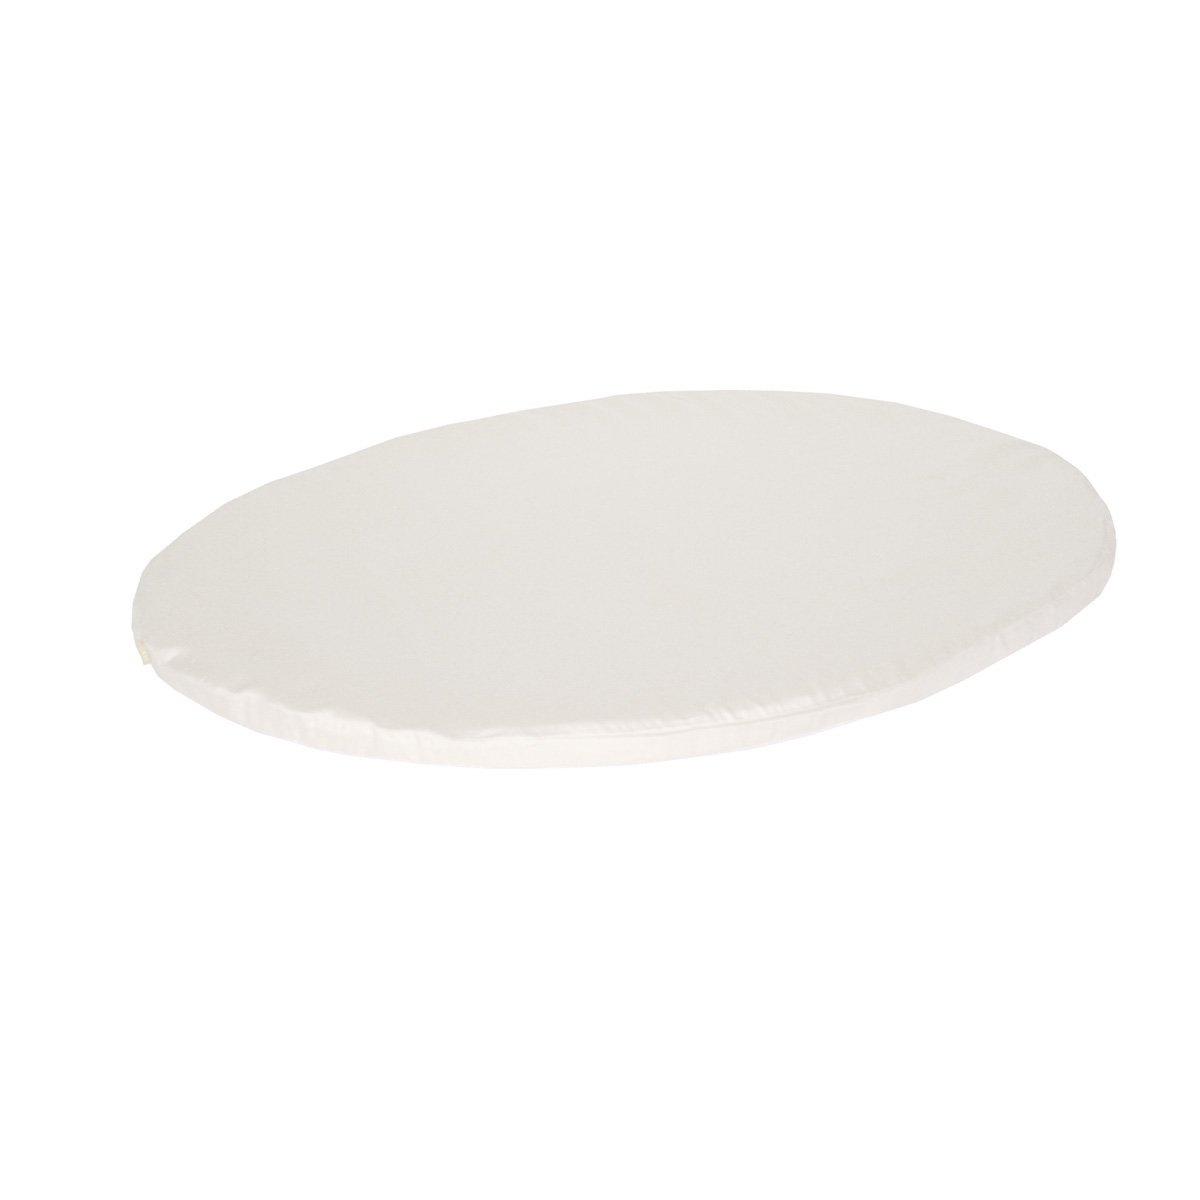 Stokke Sleepi Mini Fitted Sheet, White 105201